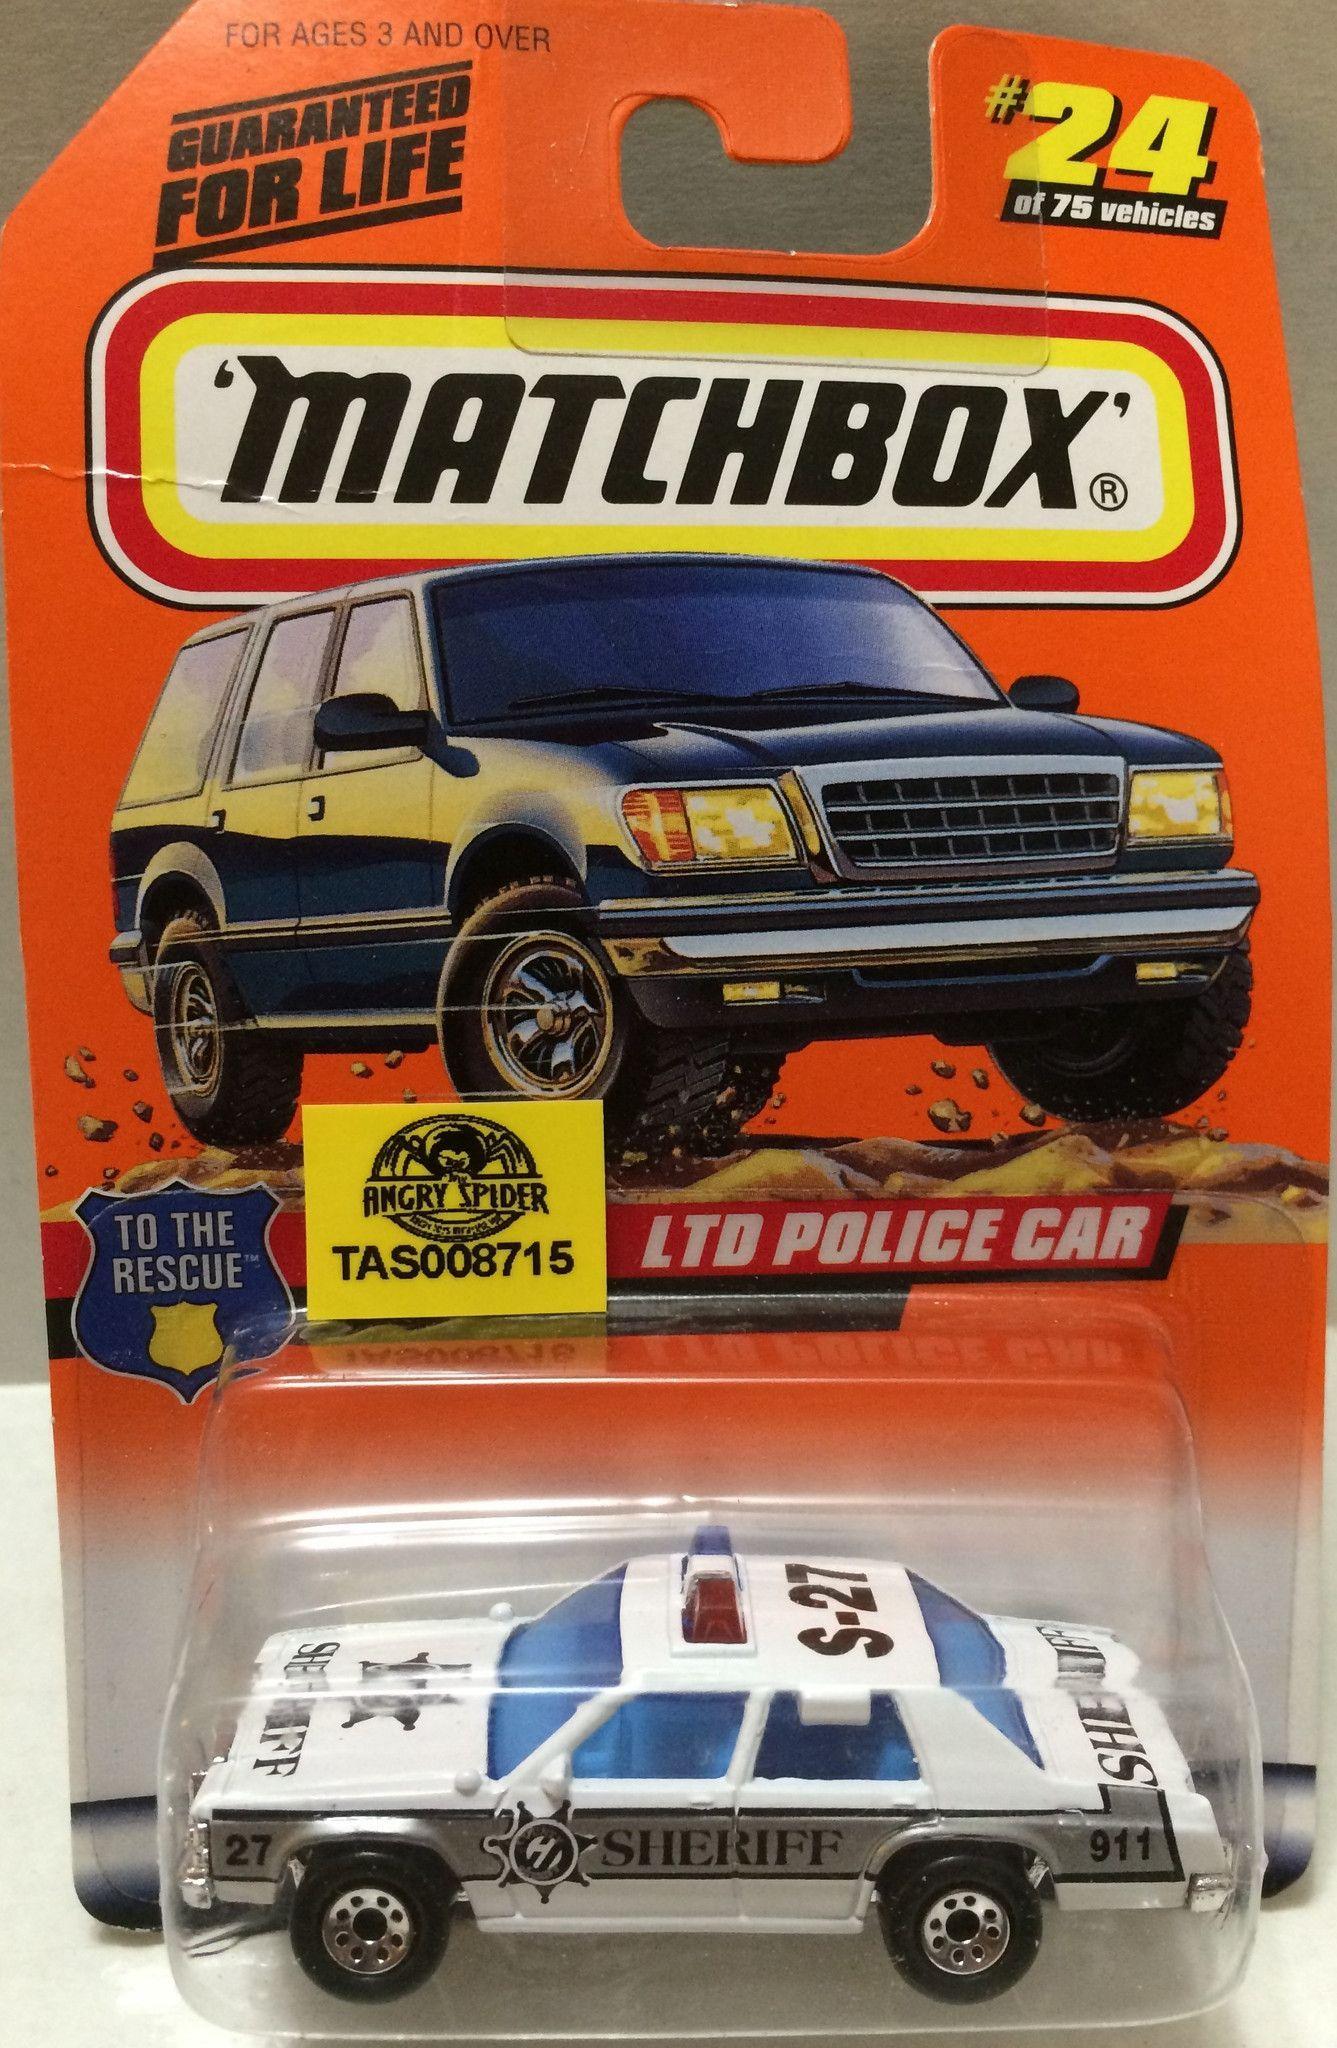 Toys cars pics  TAS  Matchbox DieCast Racing Car  LTD Police Car